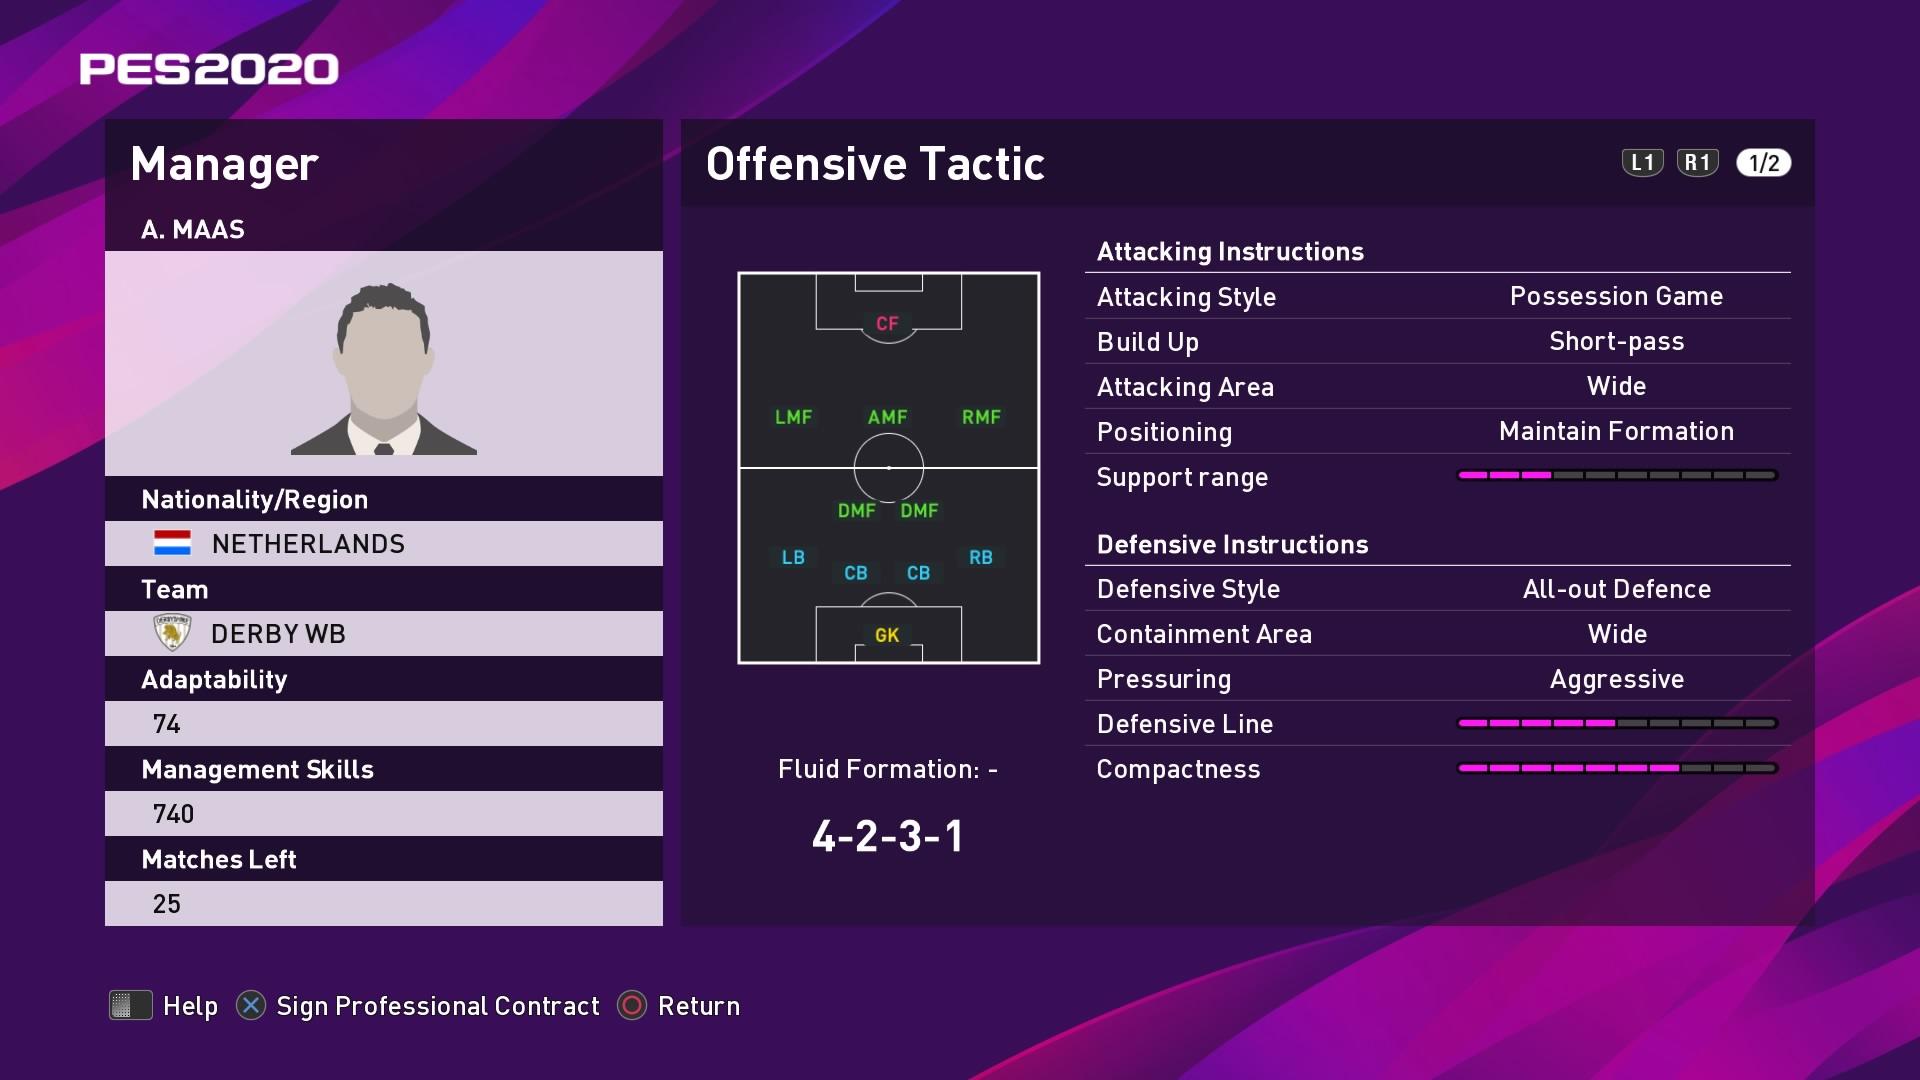 A. Maas (2) (Phillip Cocu) Offensive Tactic in PES 2020 myClub